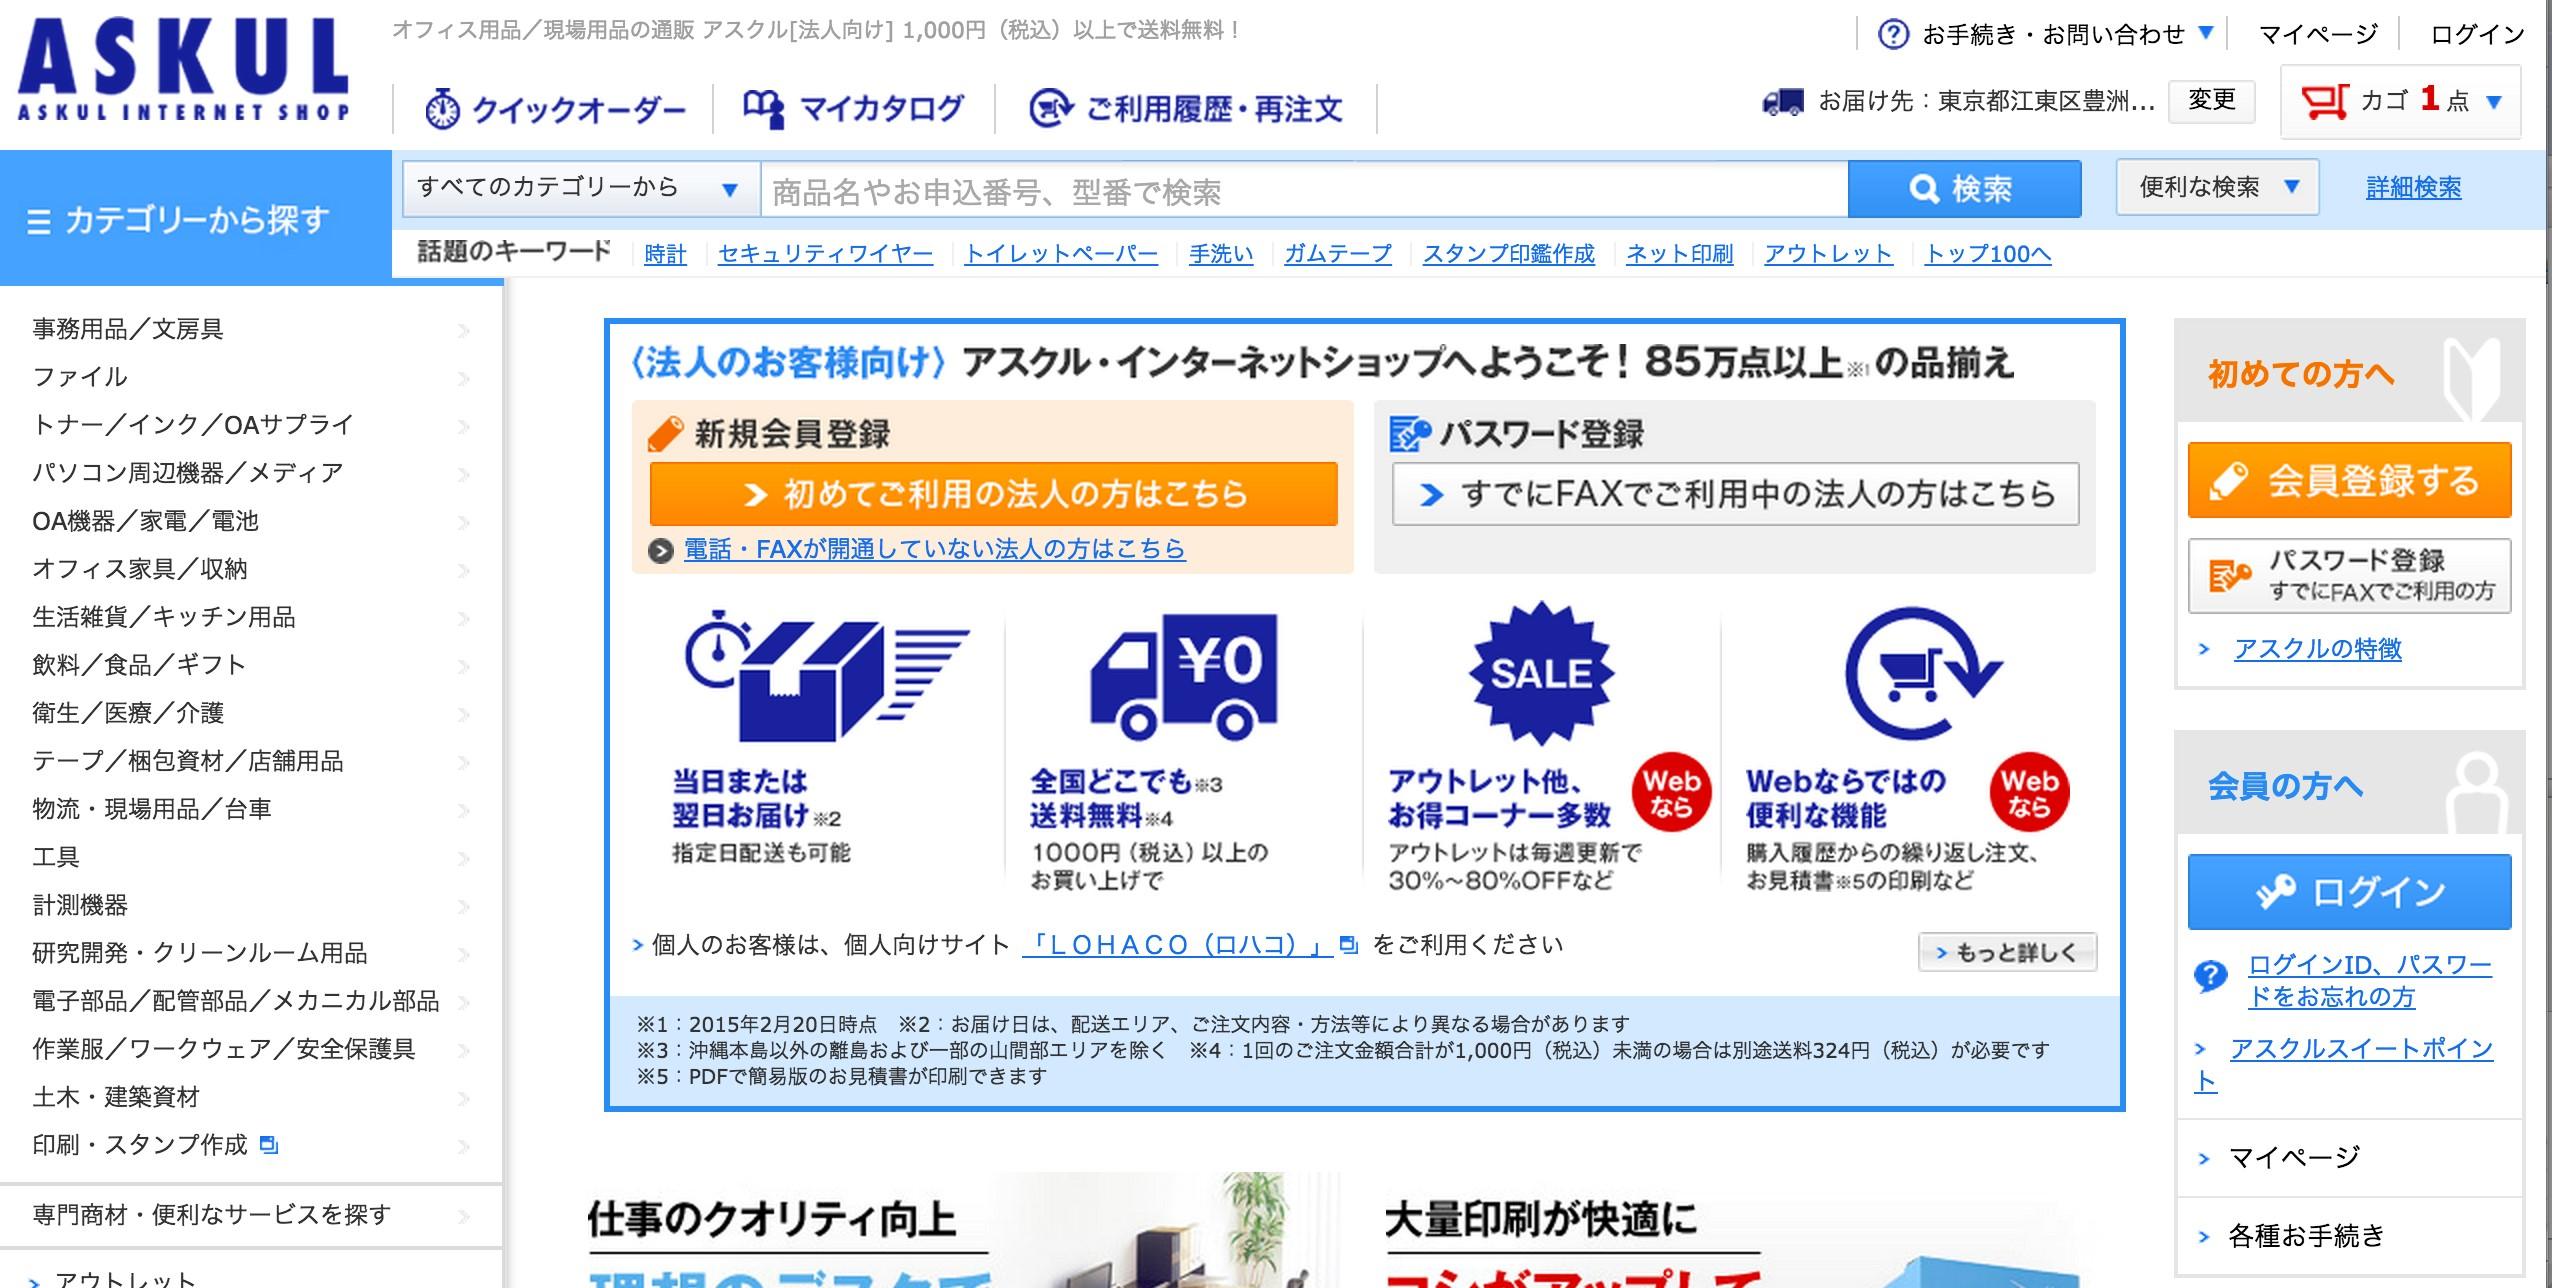 Askul webpage screen